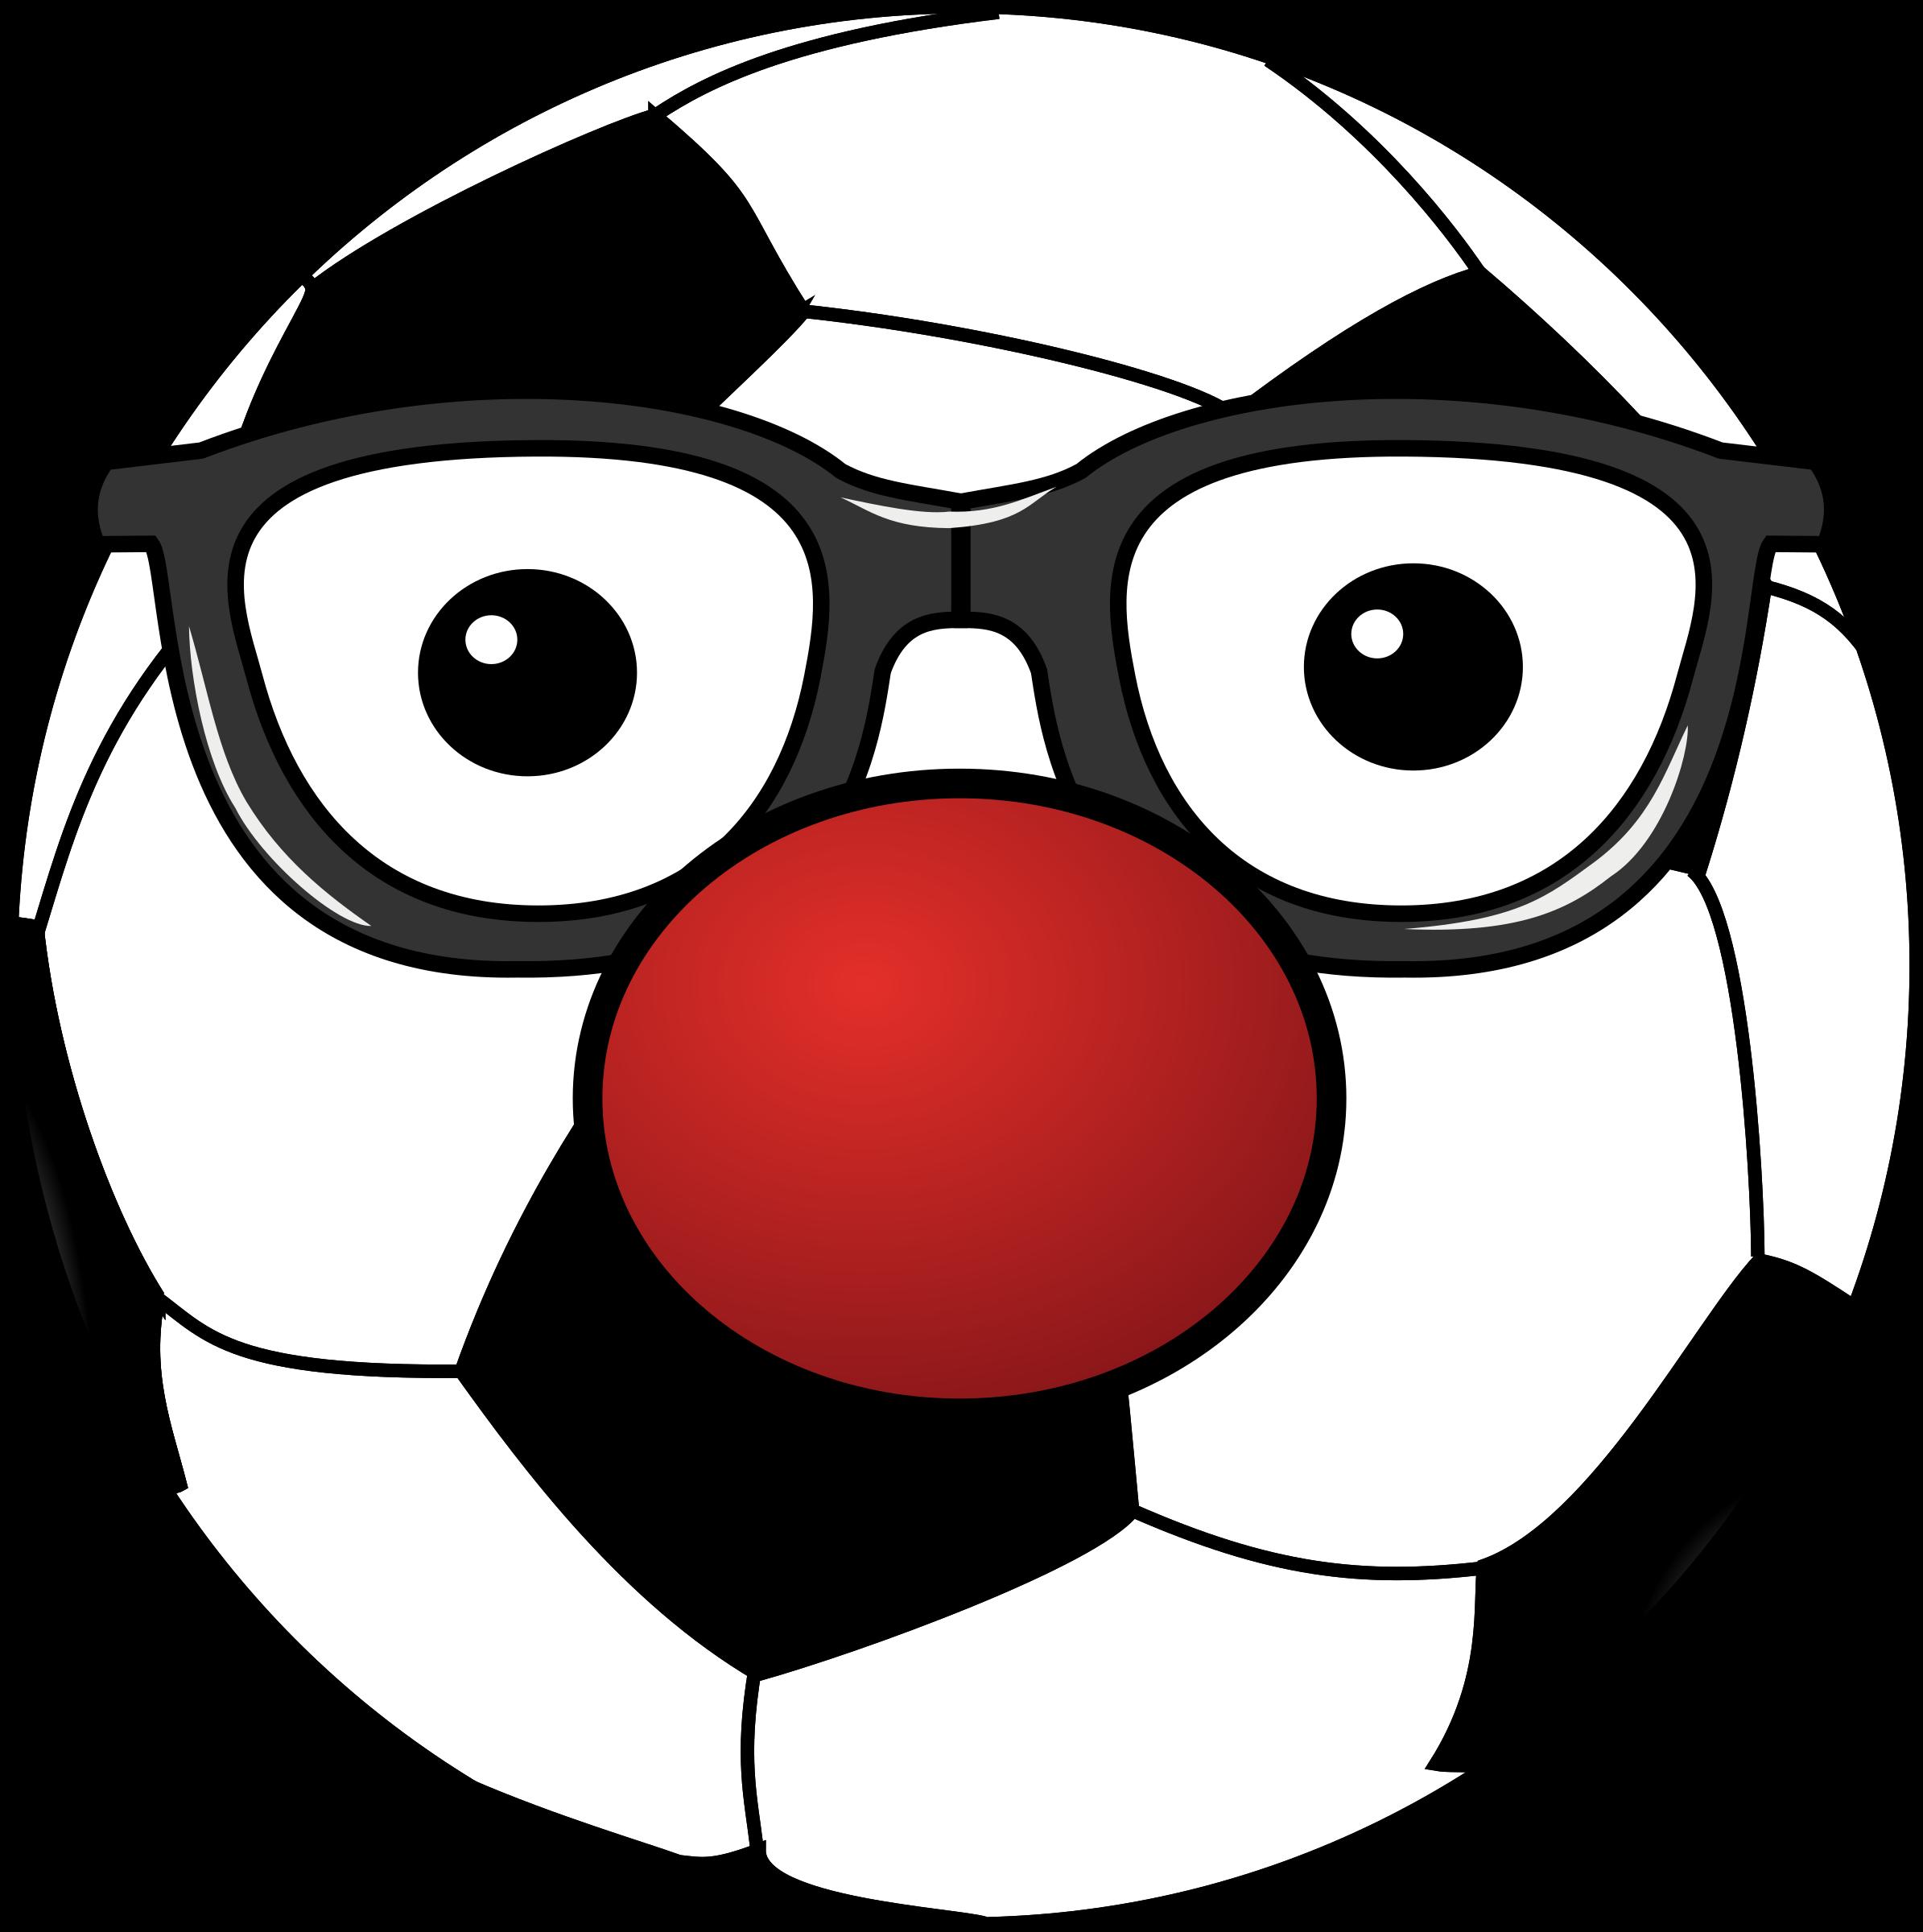 Clown clipart eye. Clowny soccer ball big